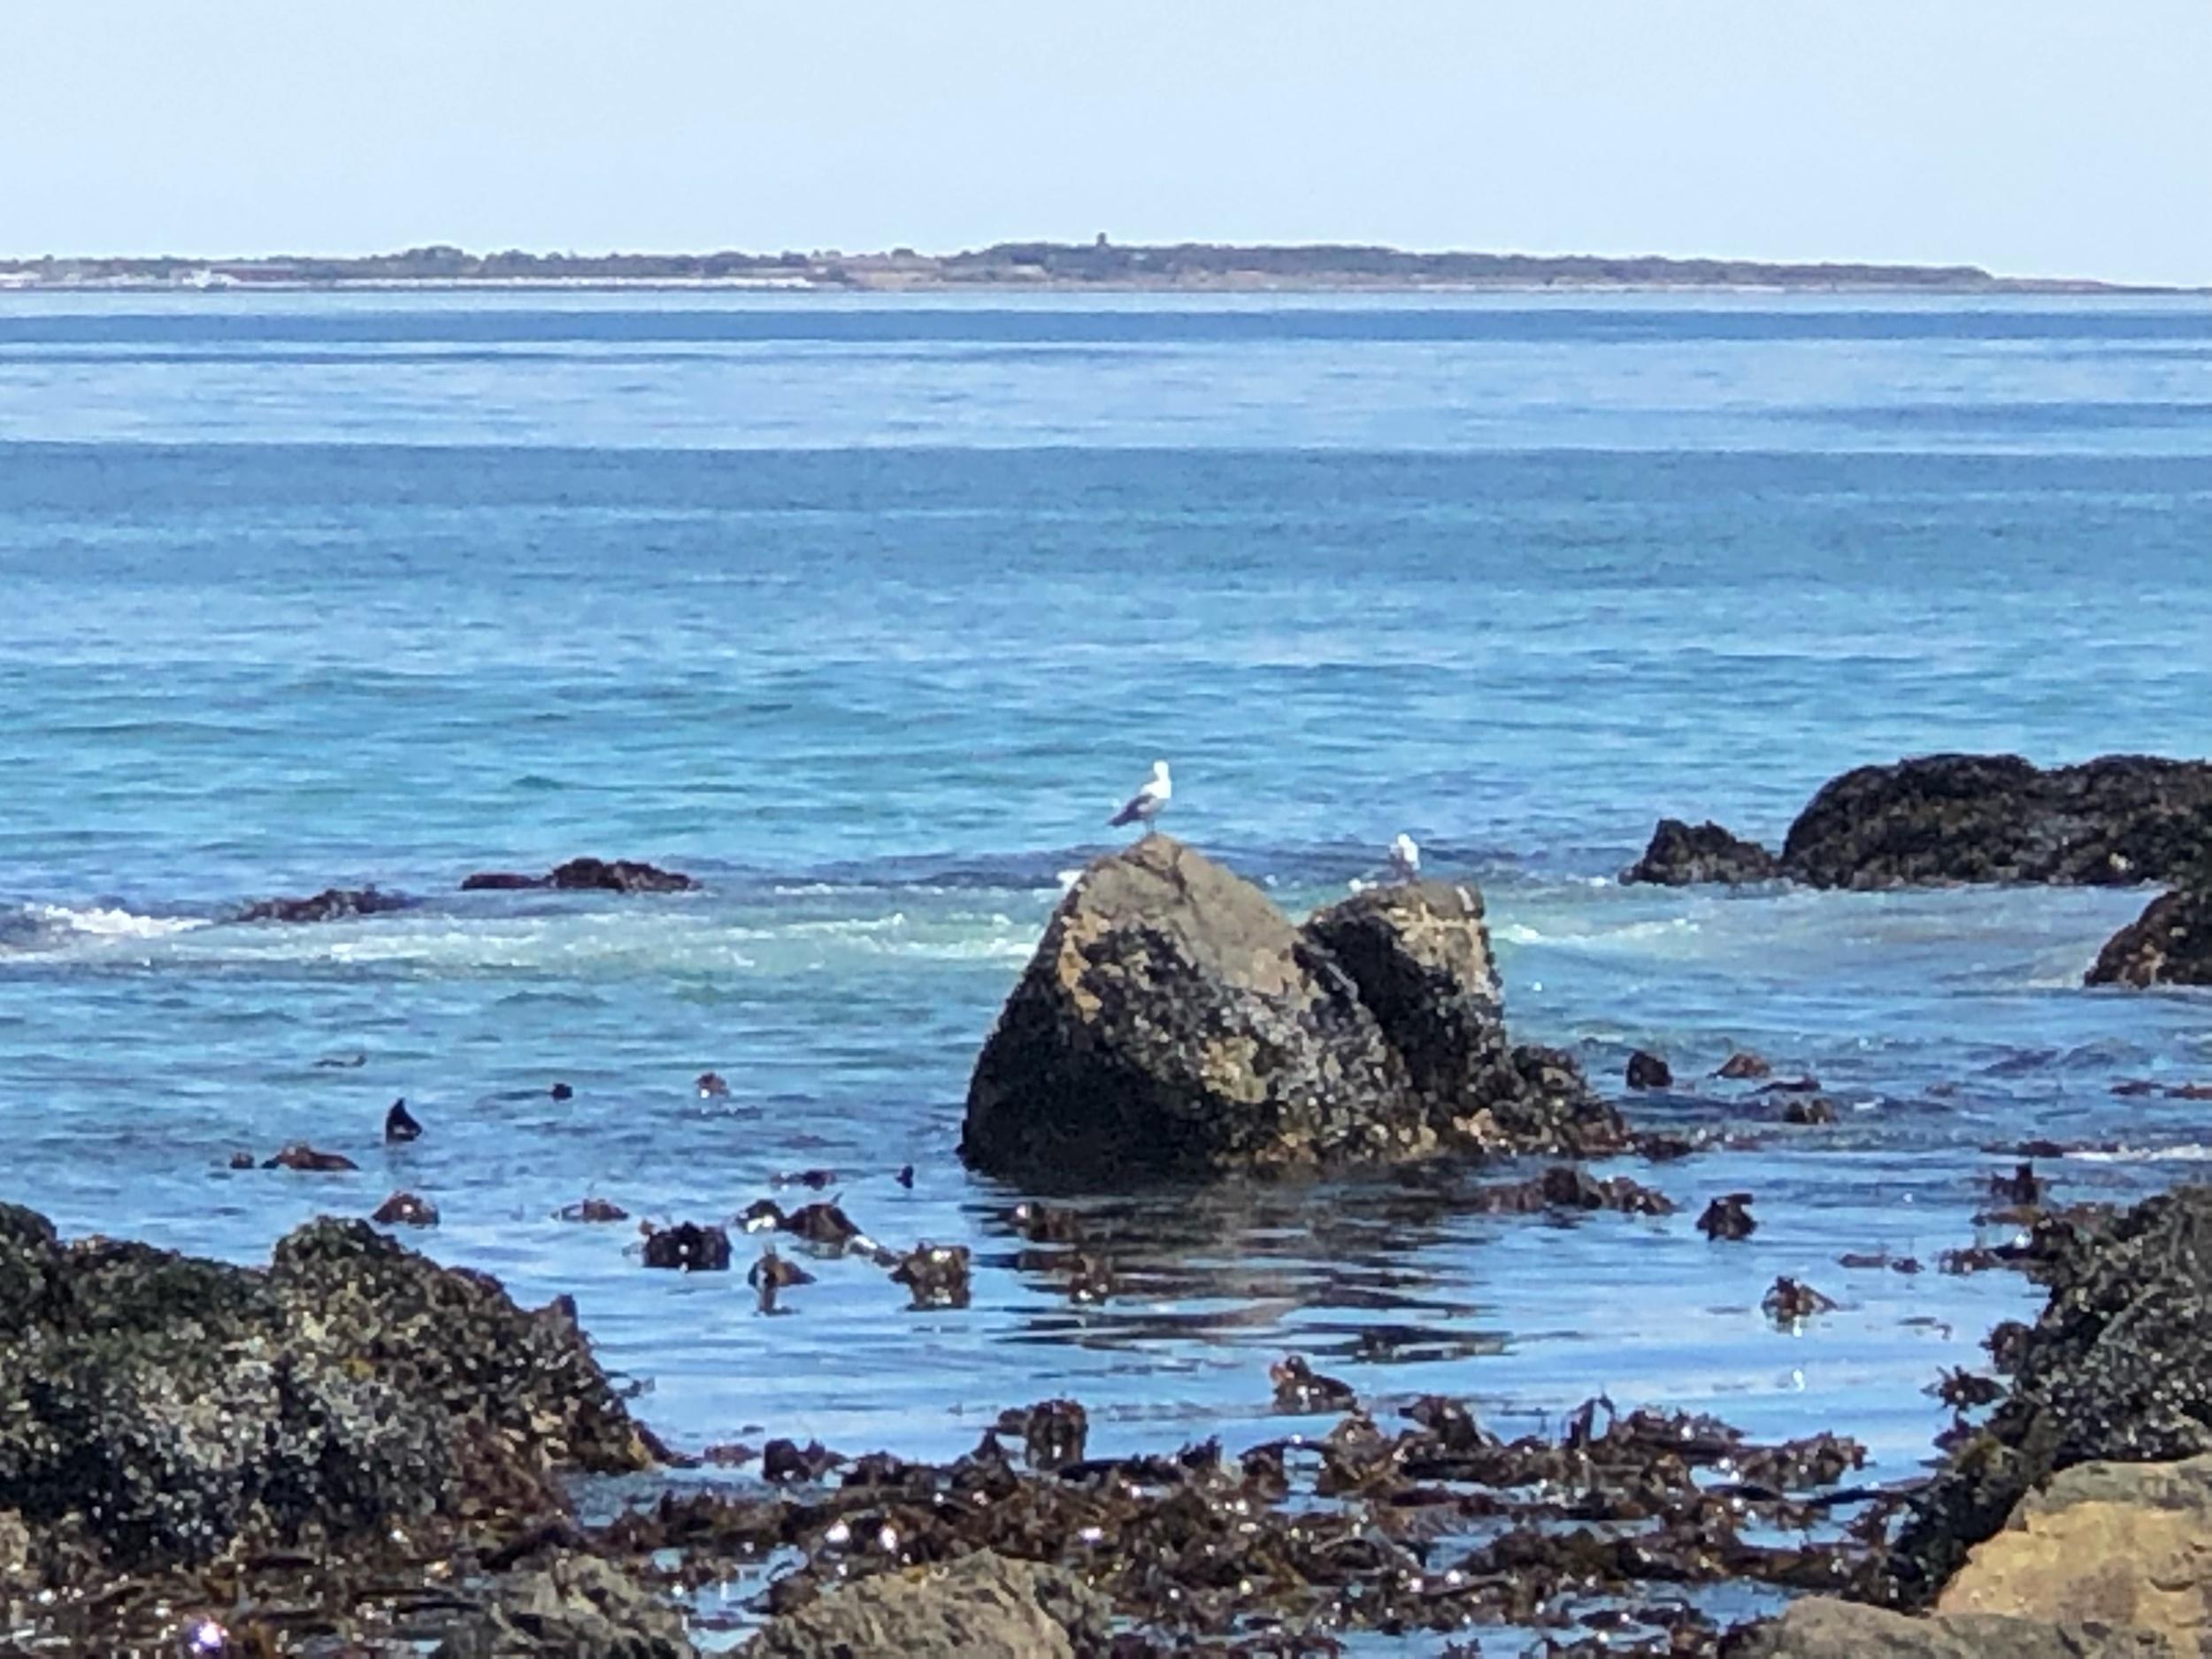 Birds resting on rocks in Cape Town